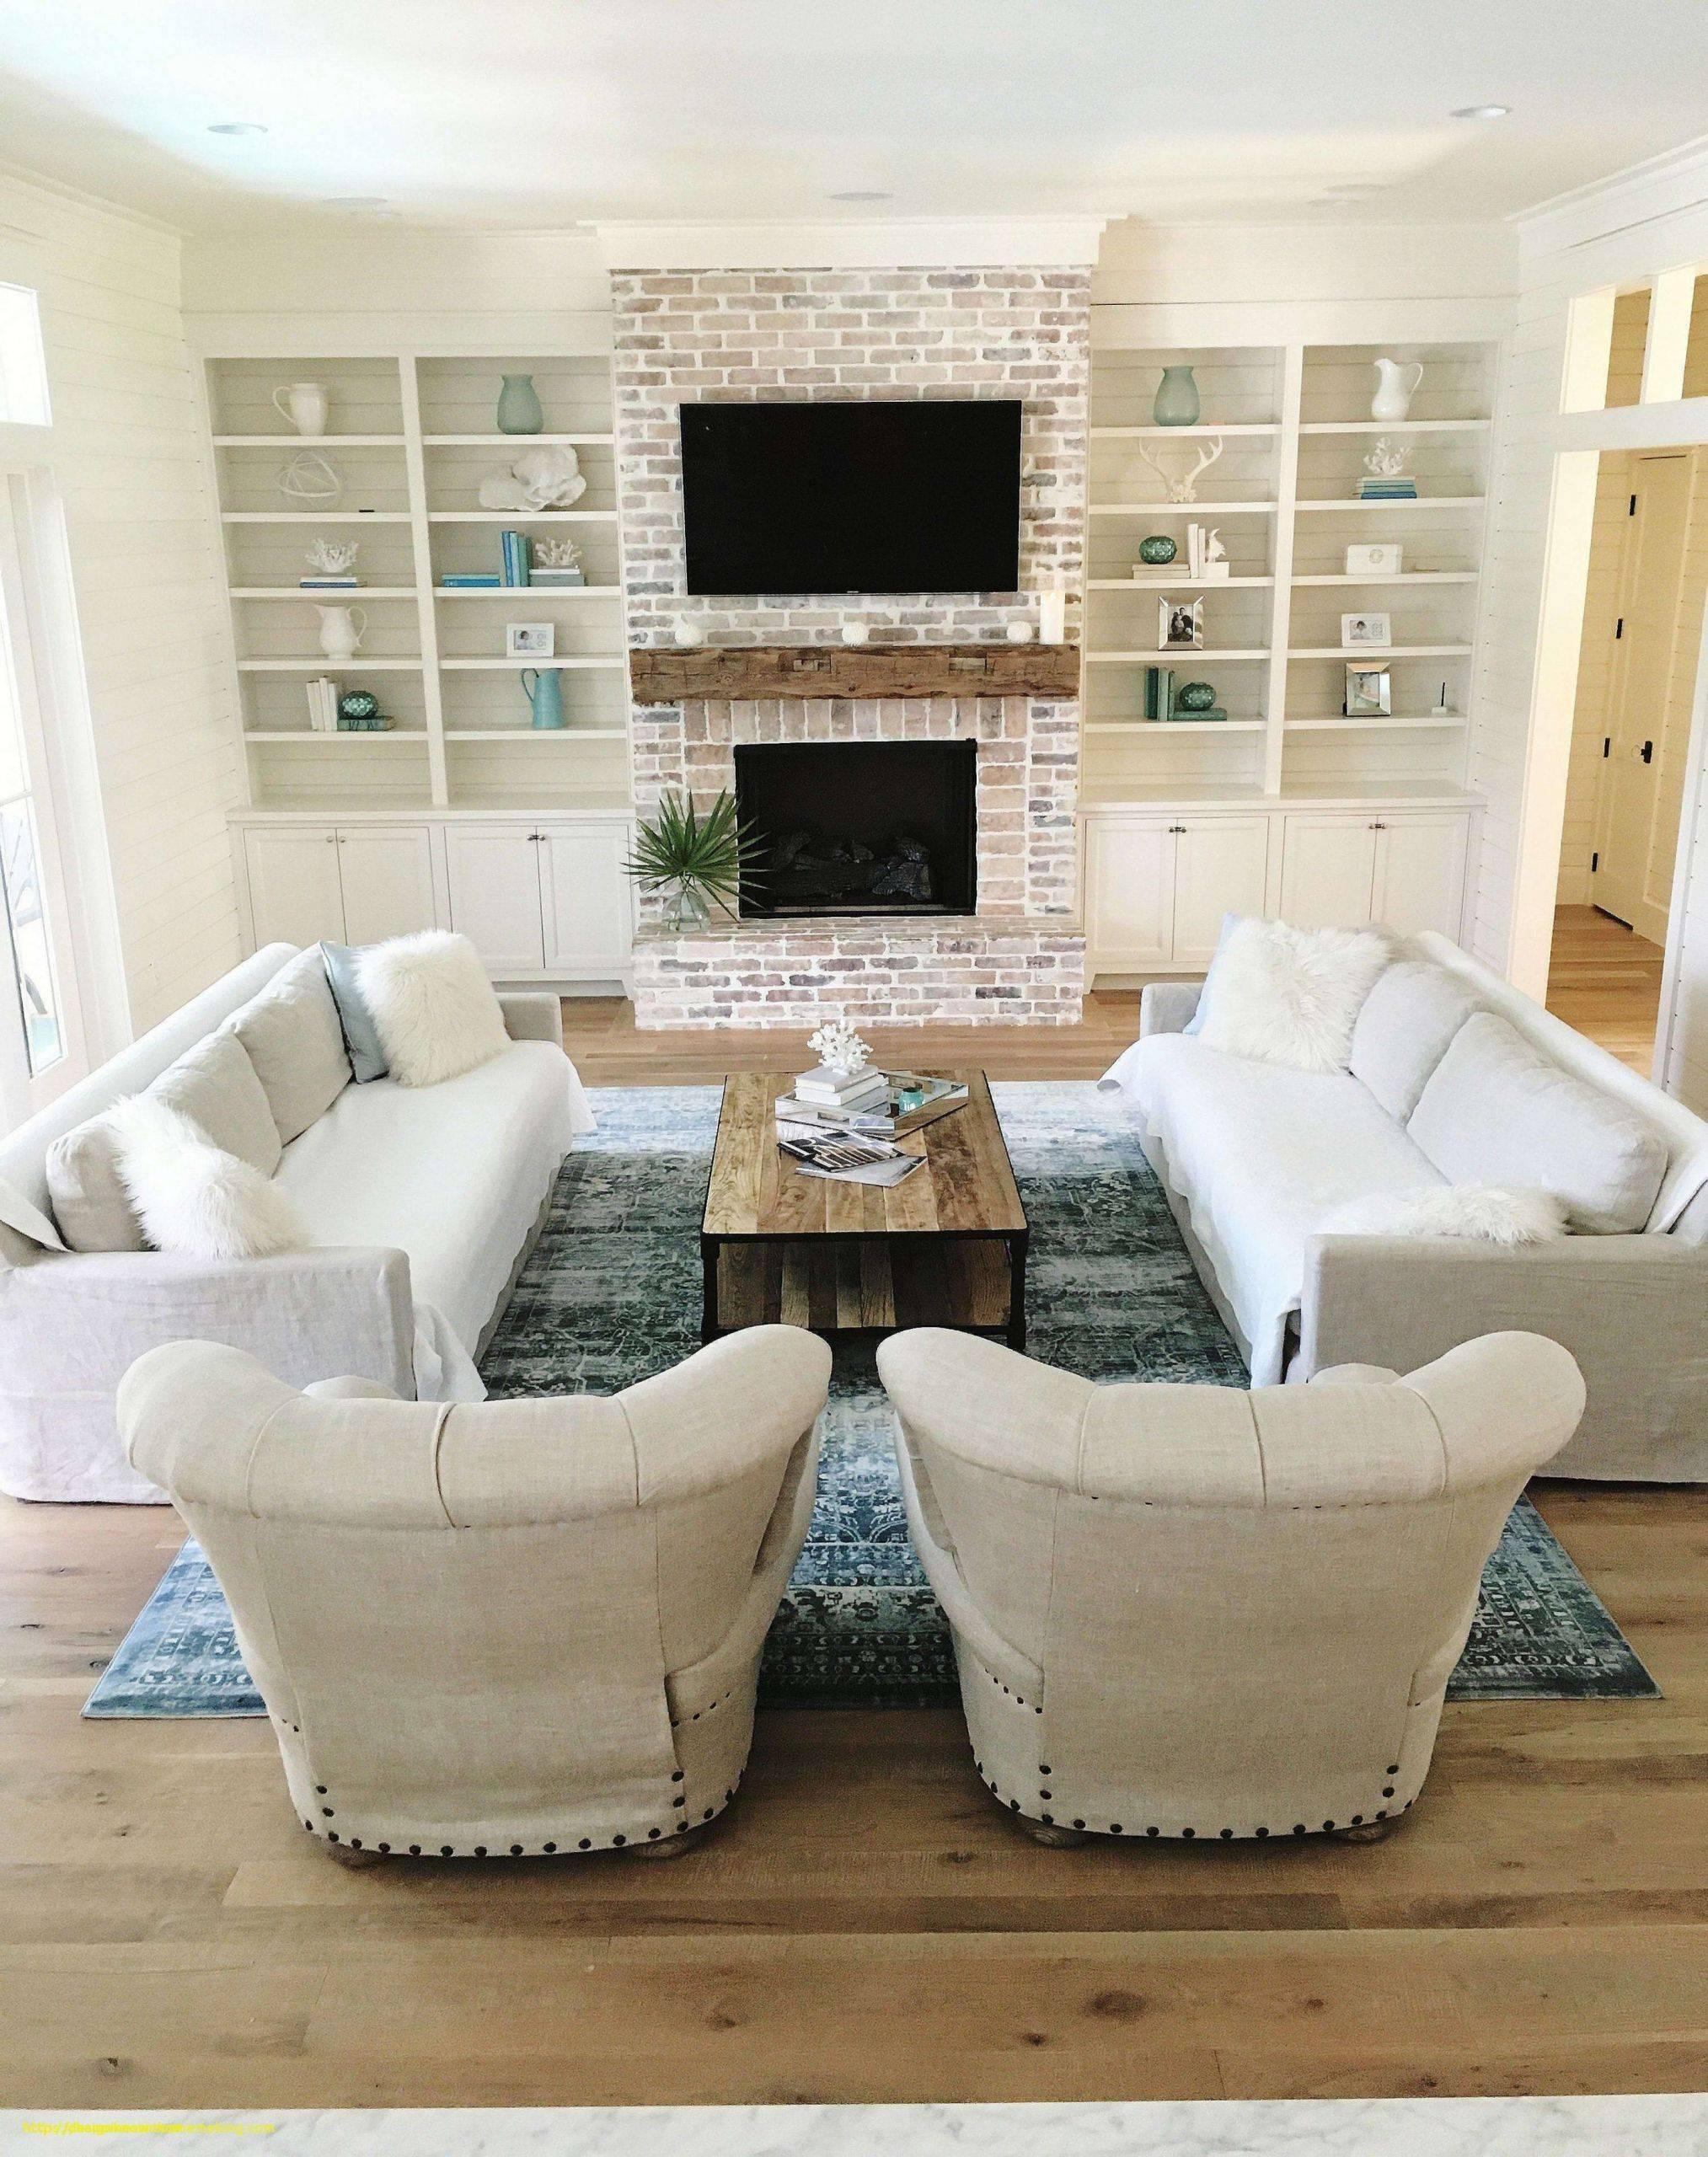 best modern house plans best modern interior design for small spaces of best modern house plans 1 scaled